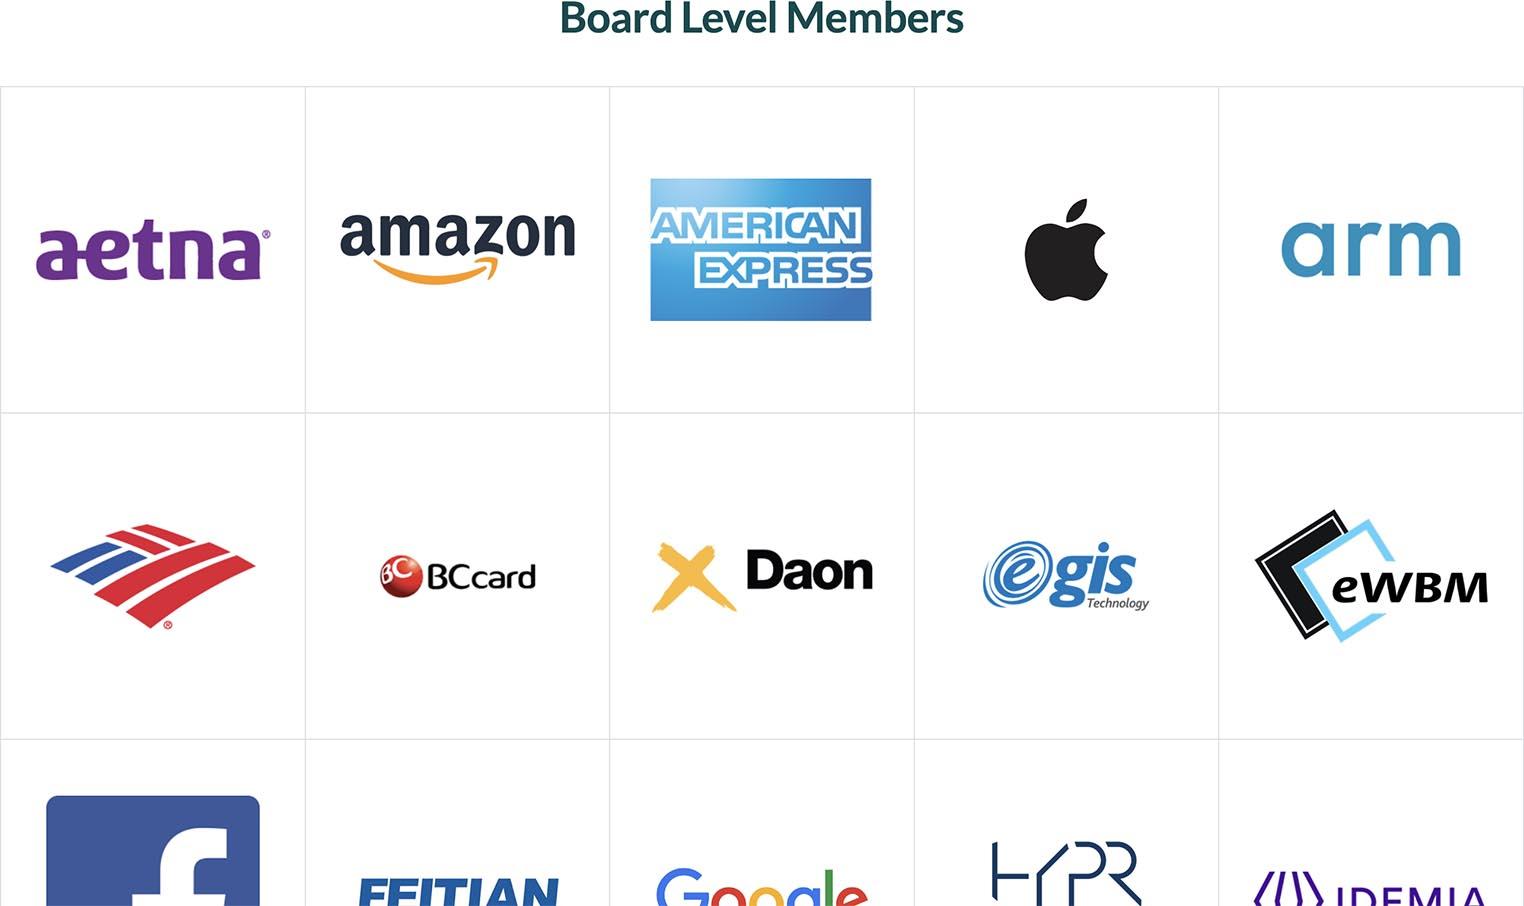 Apple FIDO Alliance member